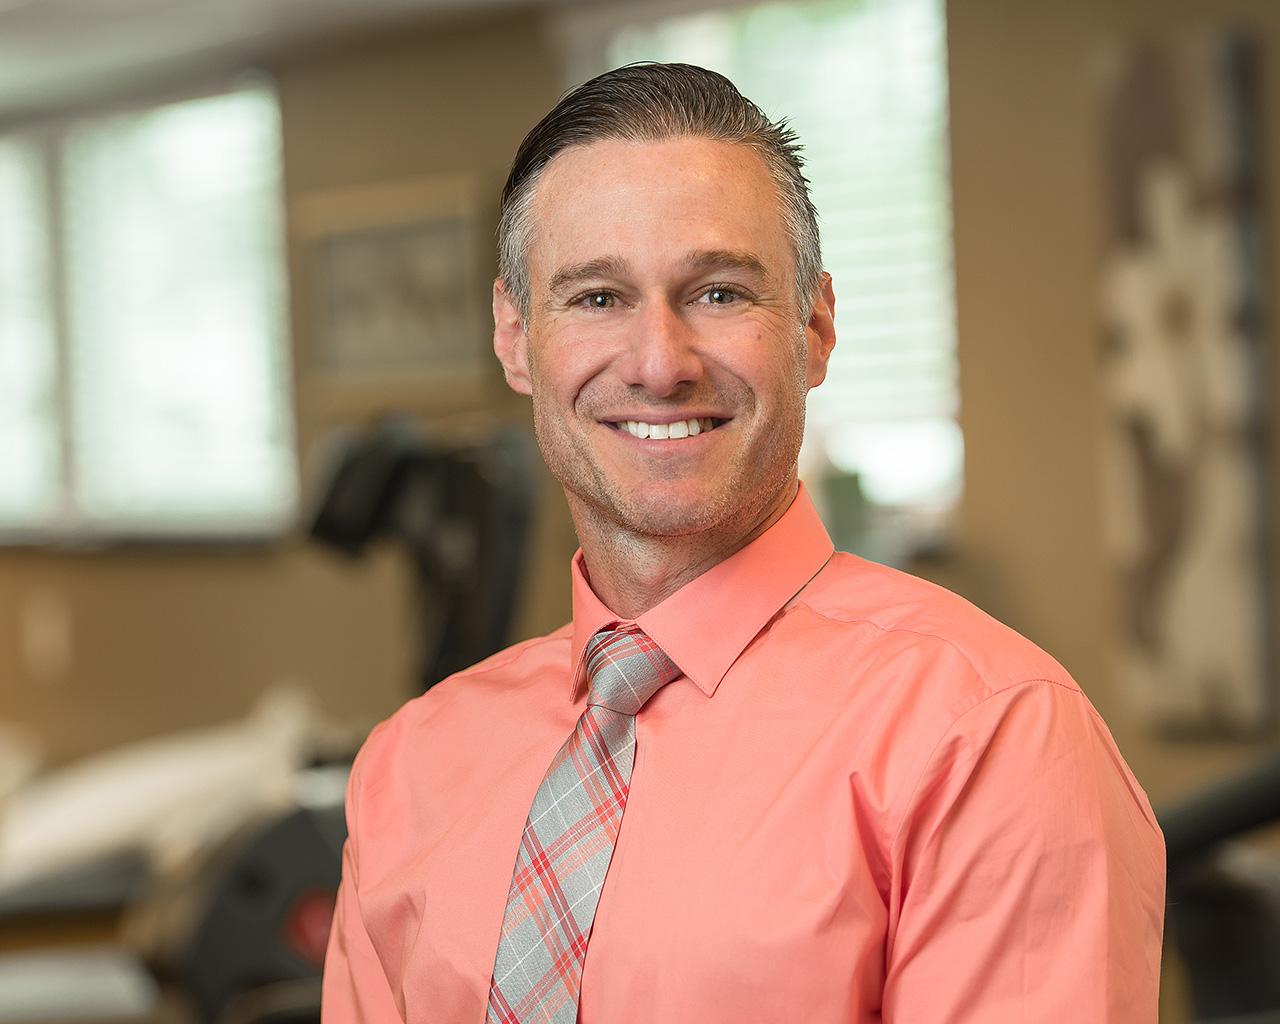 Lattimore Physical Therapist AJ Hanaburgh